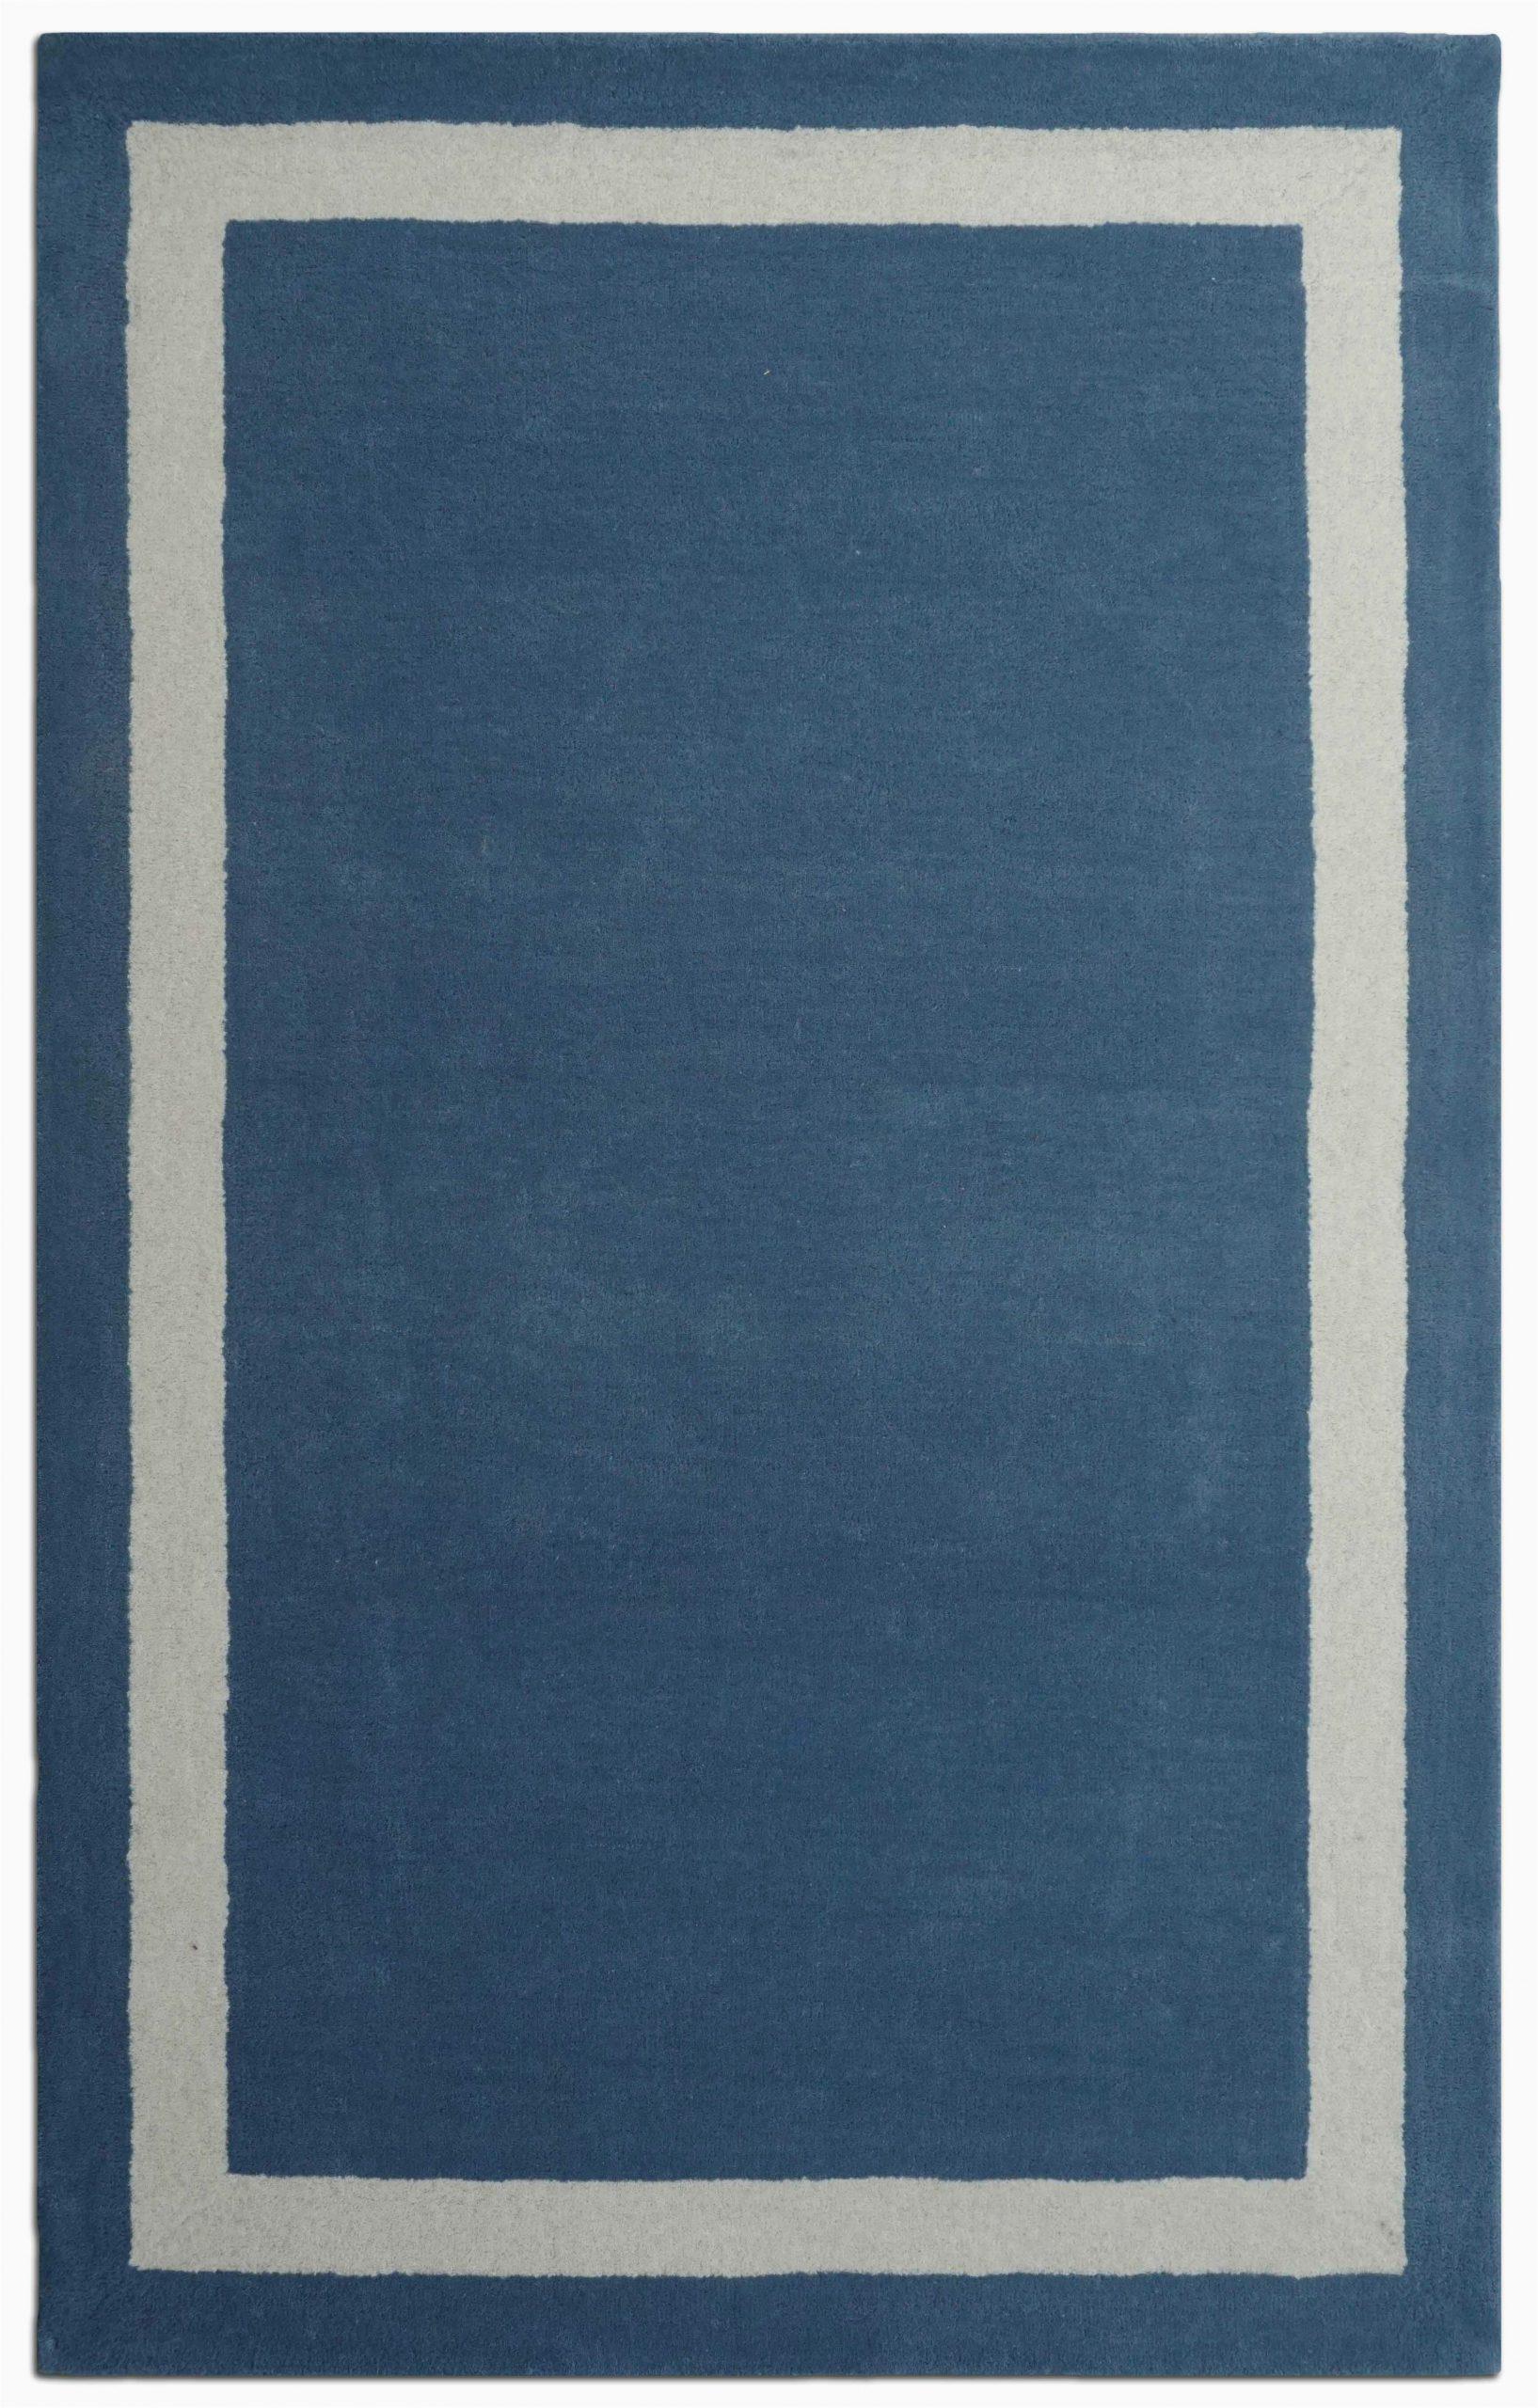 Navy Blue Border Rug Harlem Border Hand Tufted Wool Navy Blue White area Rug